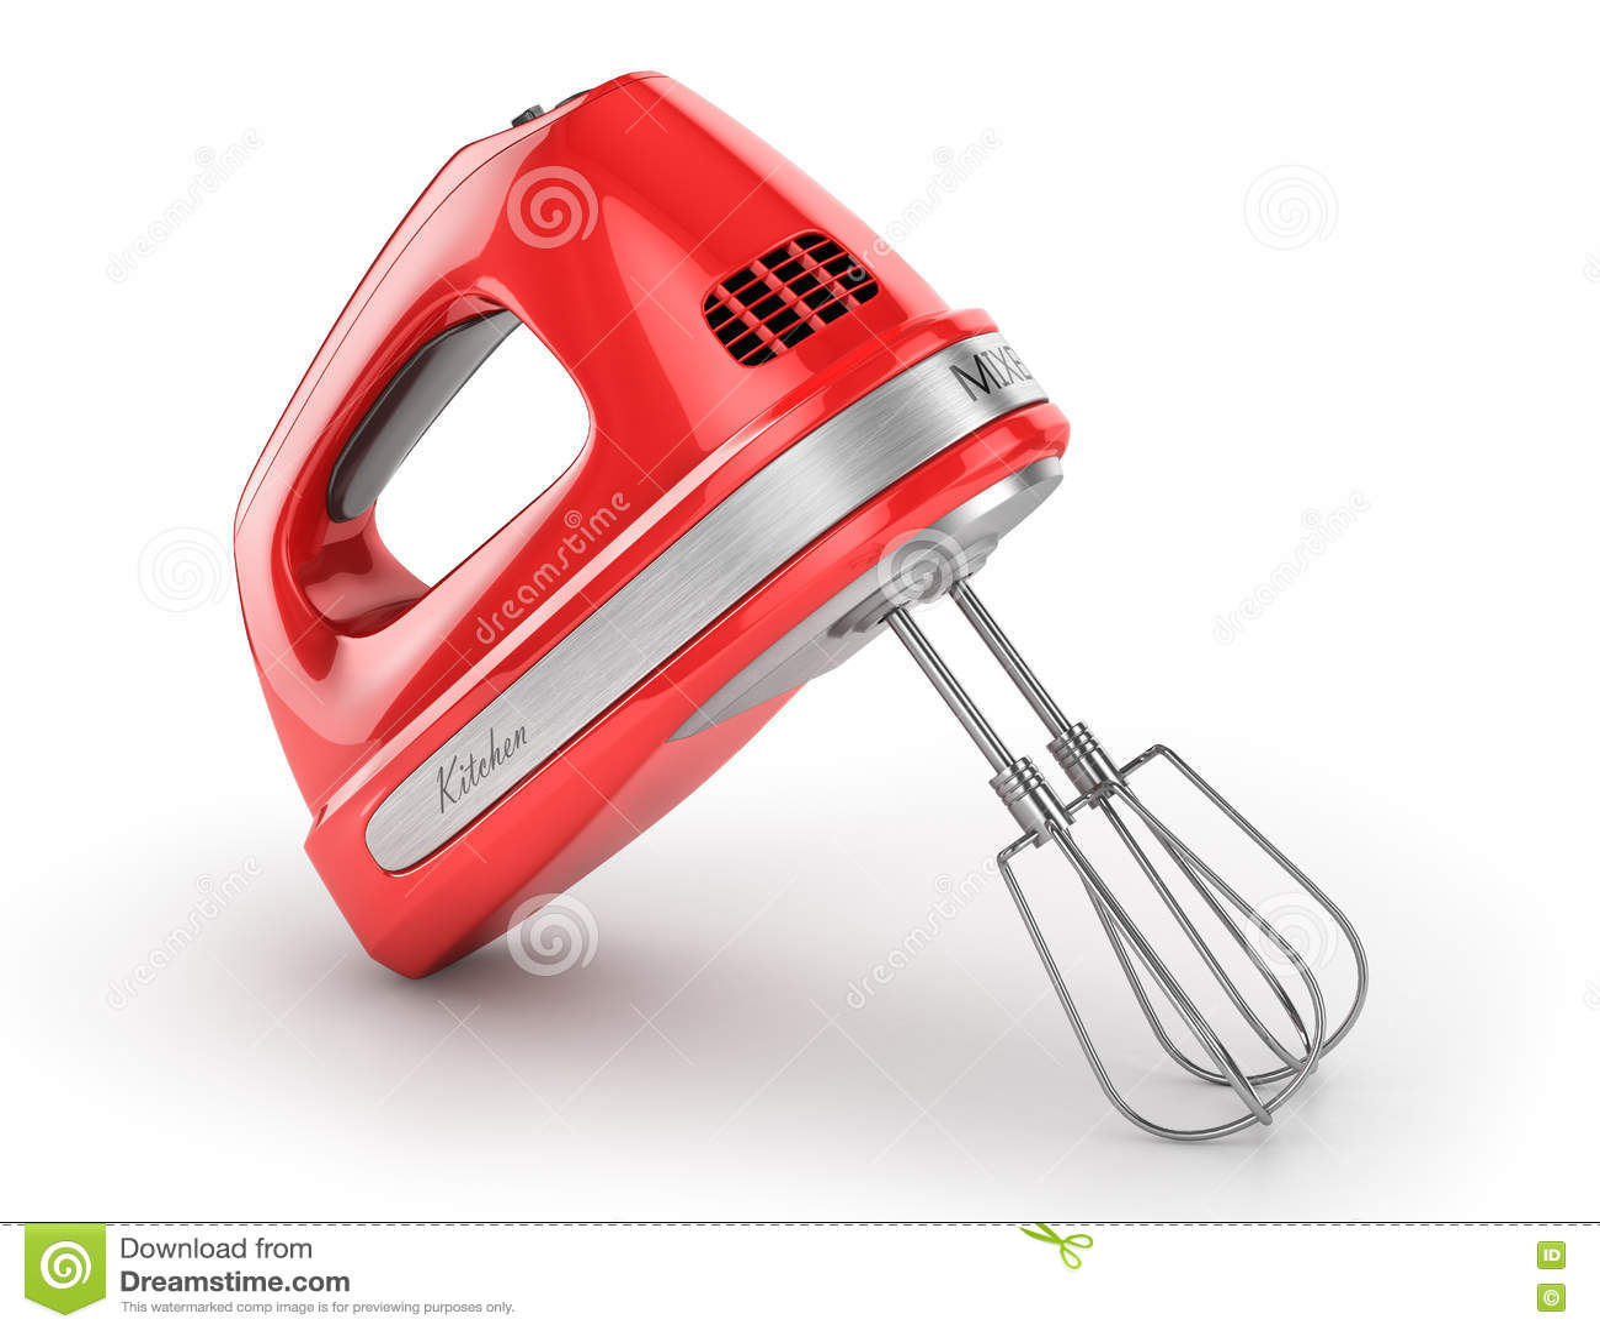 red kitchen aid mixer cheap backsplash for 红色厨房搅拌器库存例证 插画包括有例证 混合的 现代 立场 弯脚的 红色厨房搅拌器